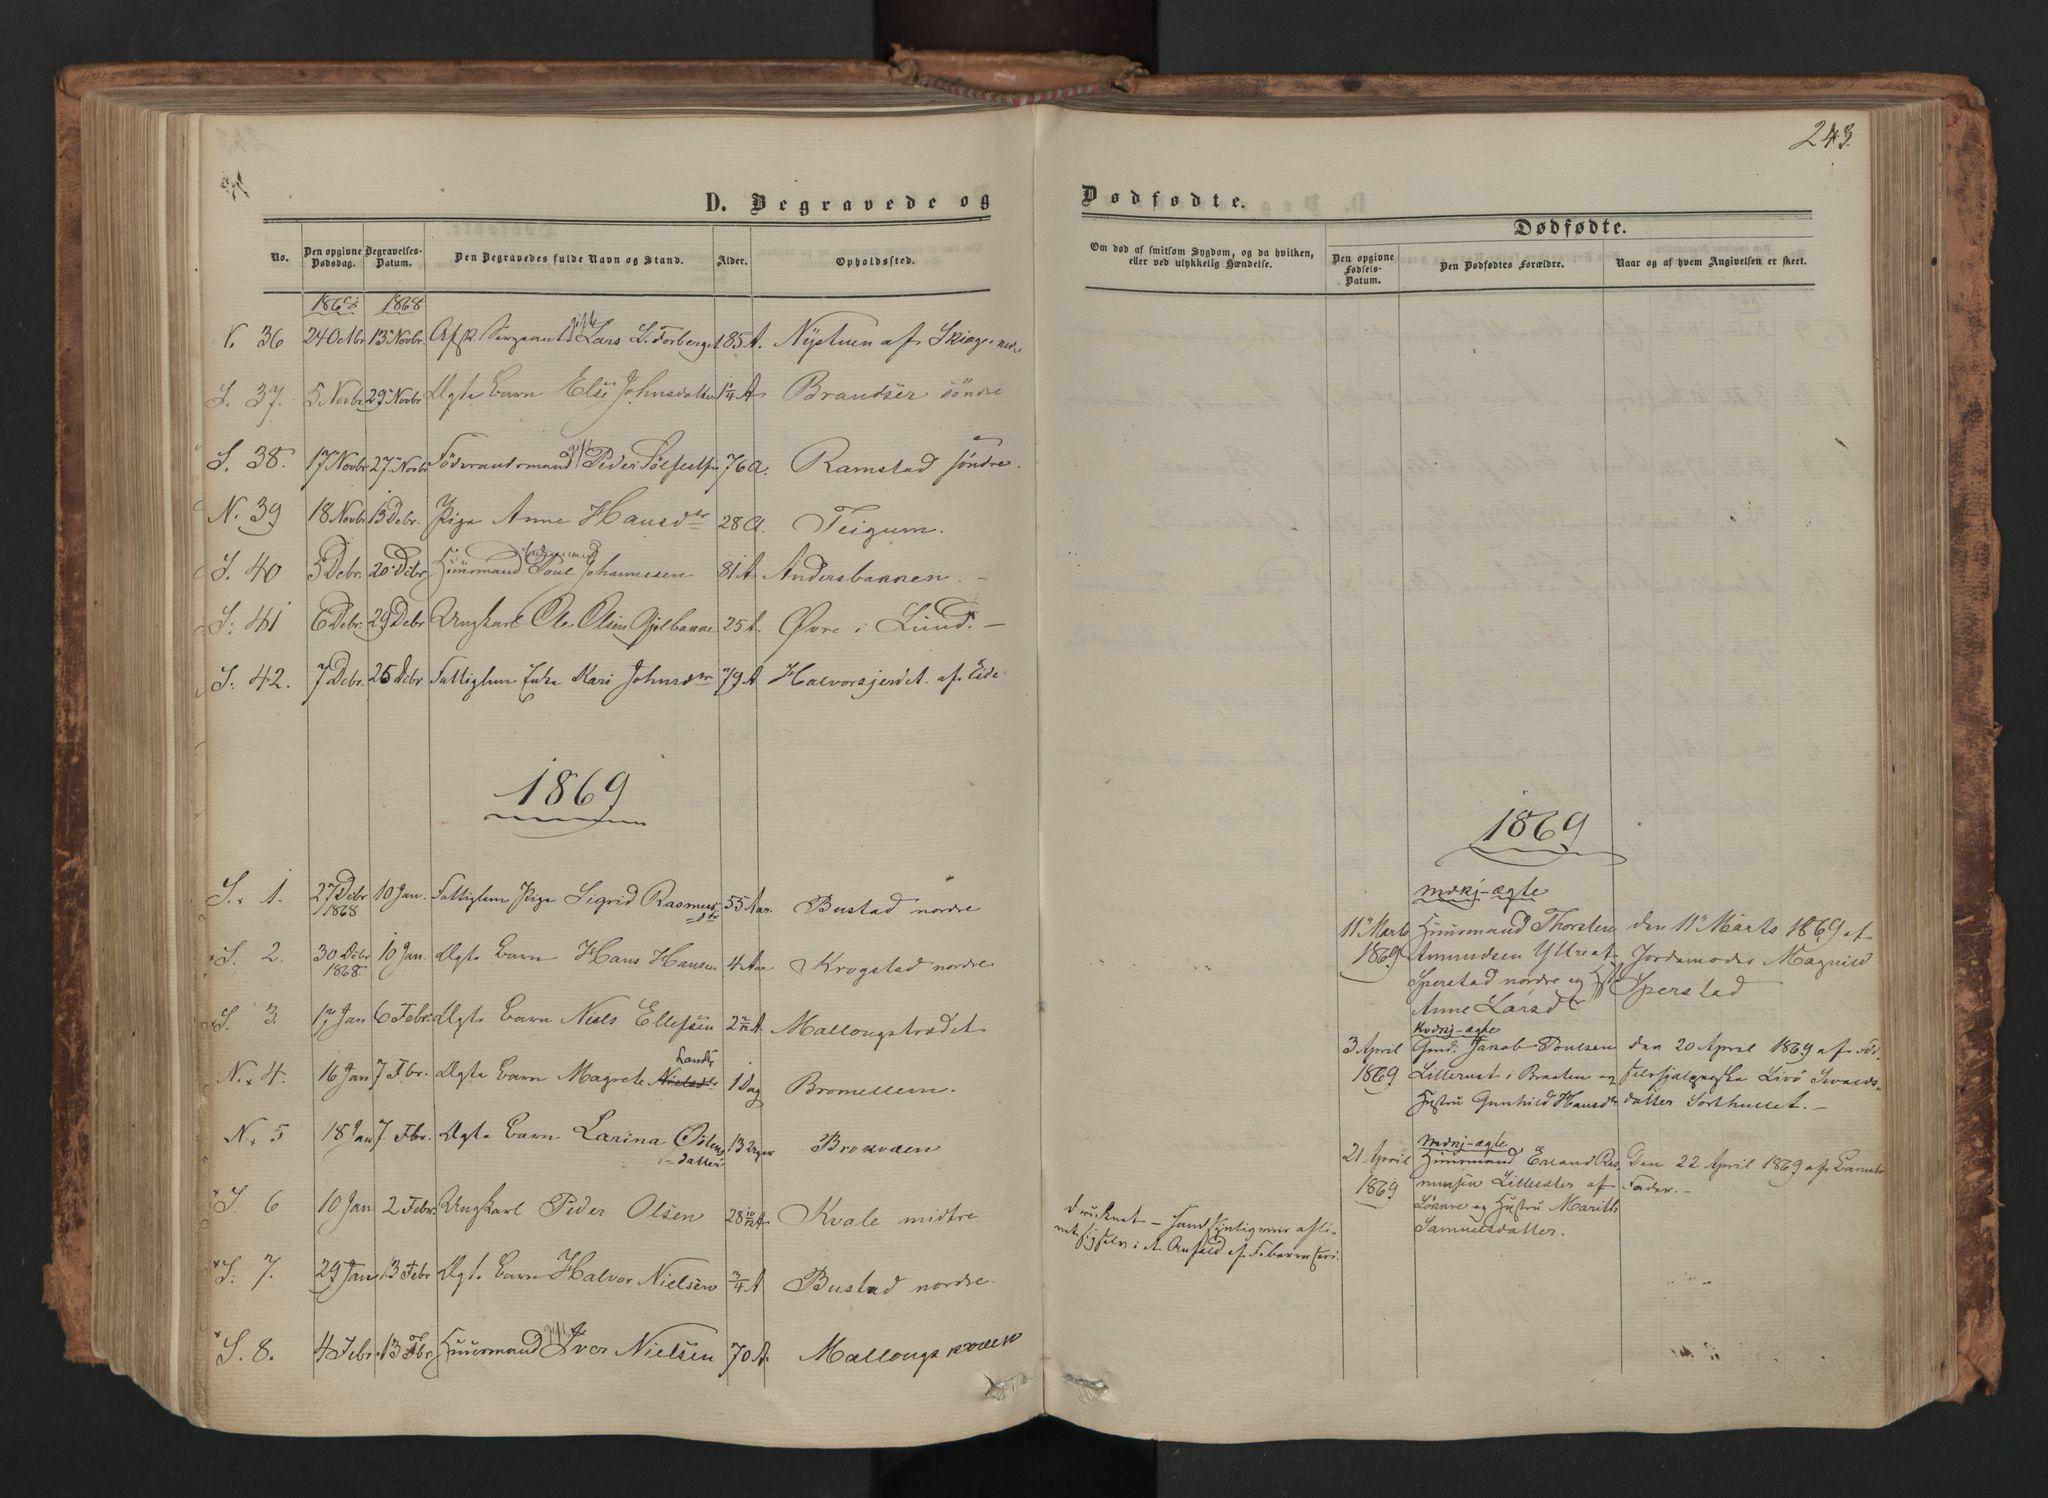 SAH, Skjåk prestekontor, Ministerialbok nr. 1, 1863-1879, s. 243